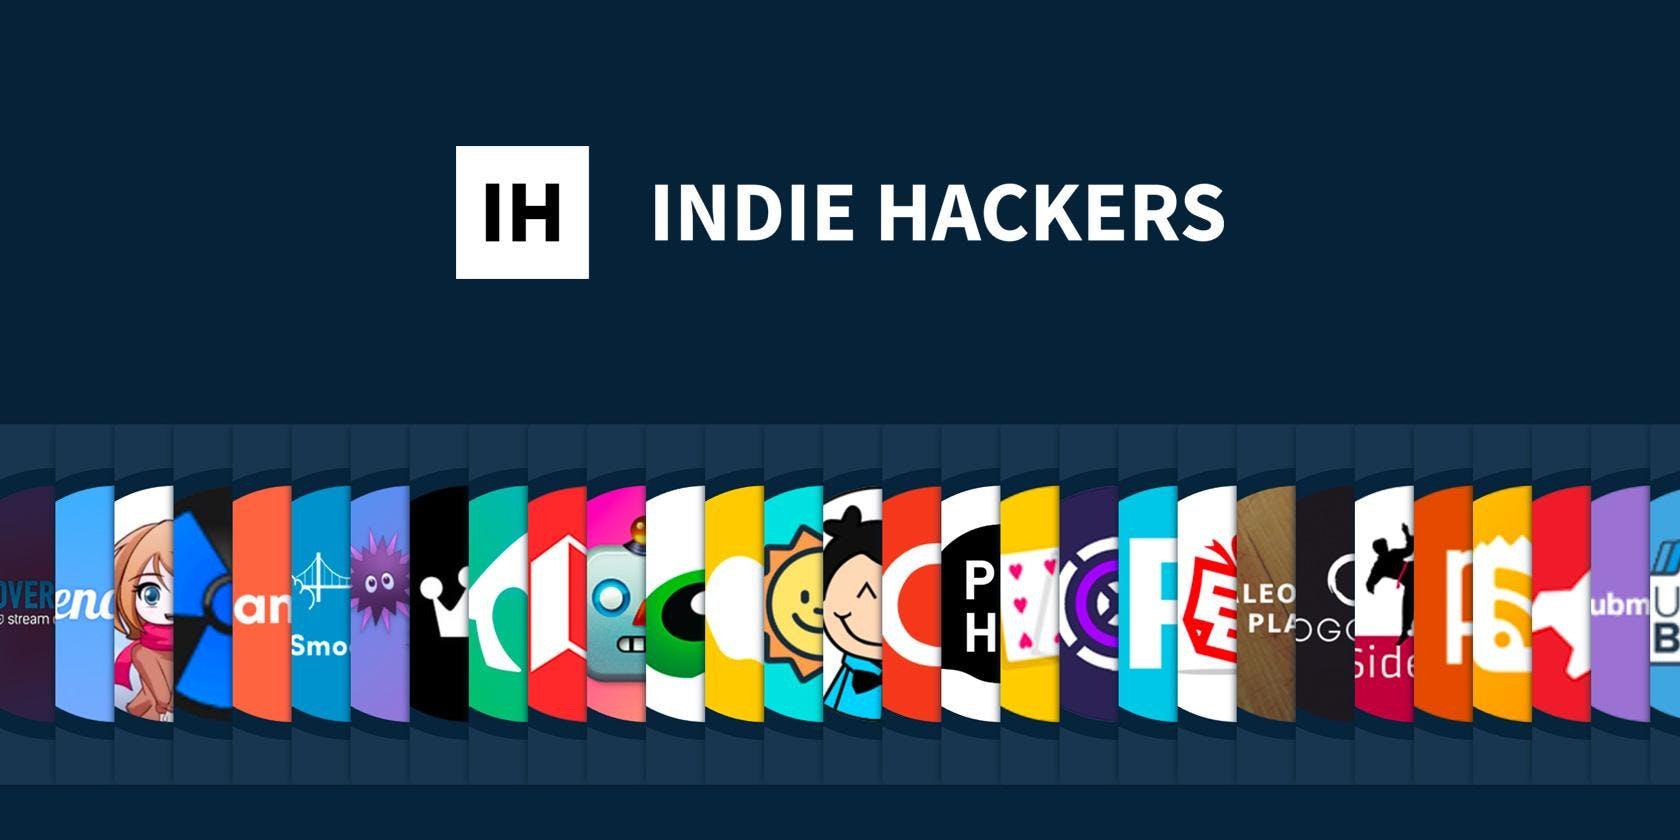 Phoenix Indie Hacker 1st Meetup